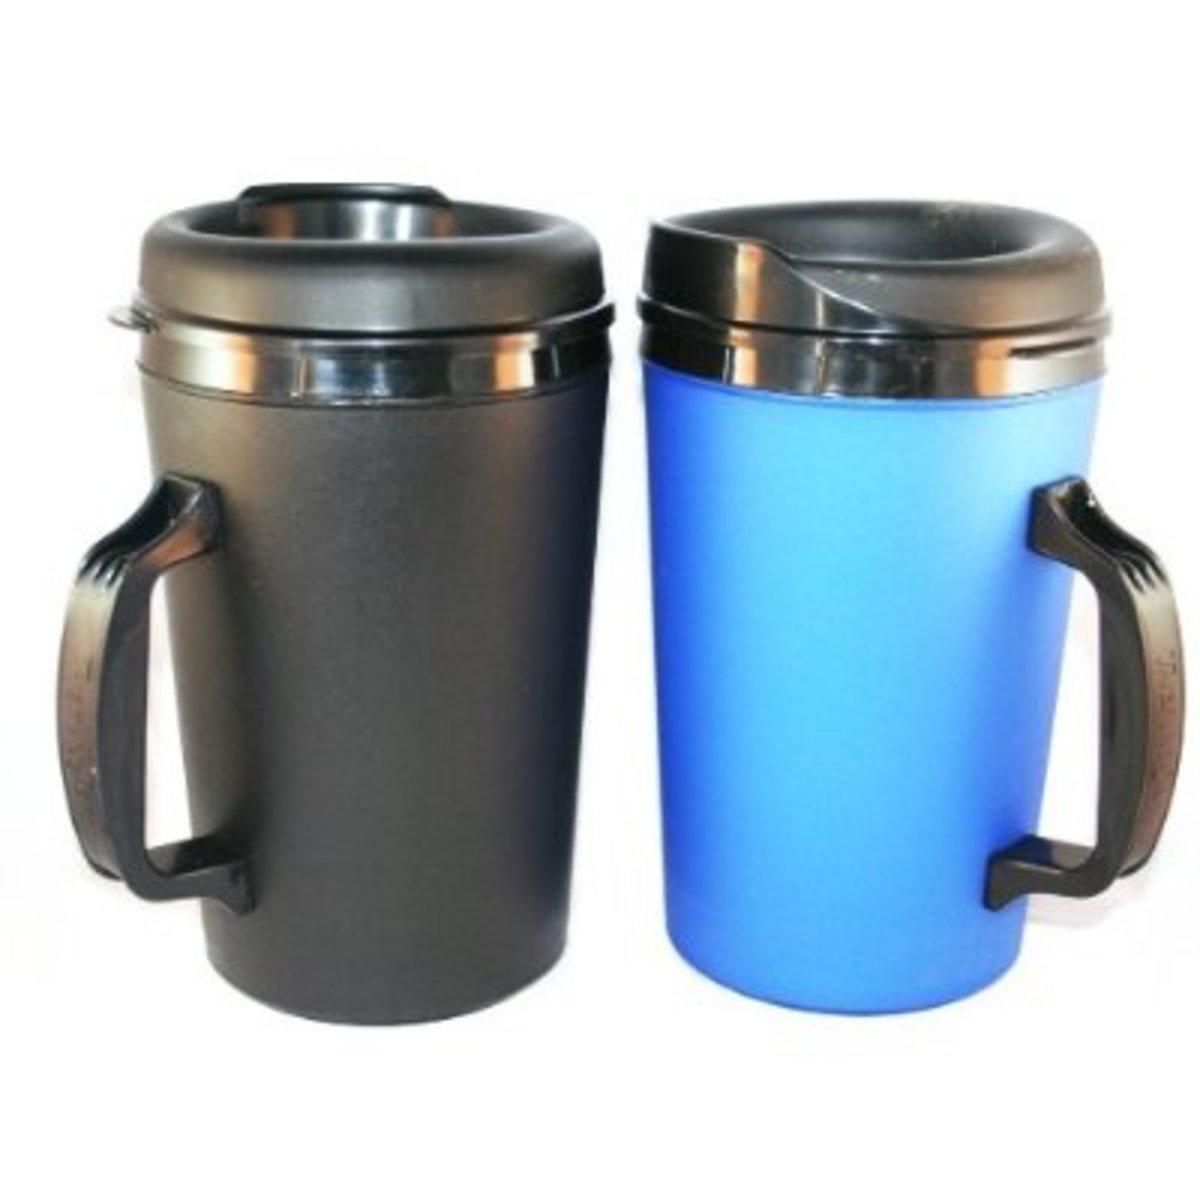 2 ThermoServ Foam Insulated Coffee Mugs 34 oz (1)Blue & (1)Black - history of coffee mugs